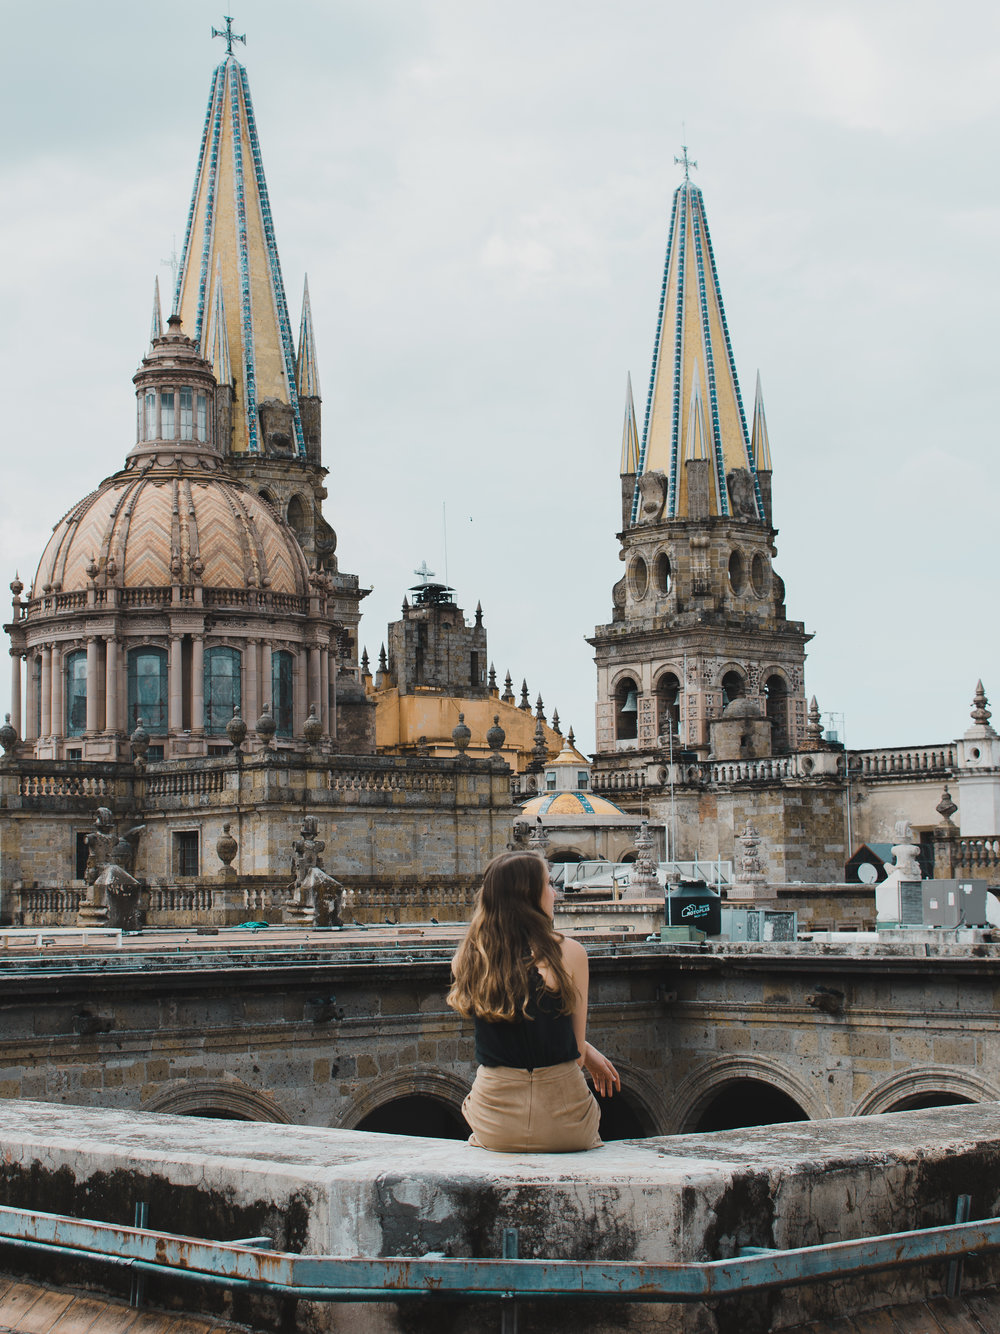 Took a bus to Guadalajara to explore a new city